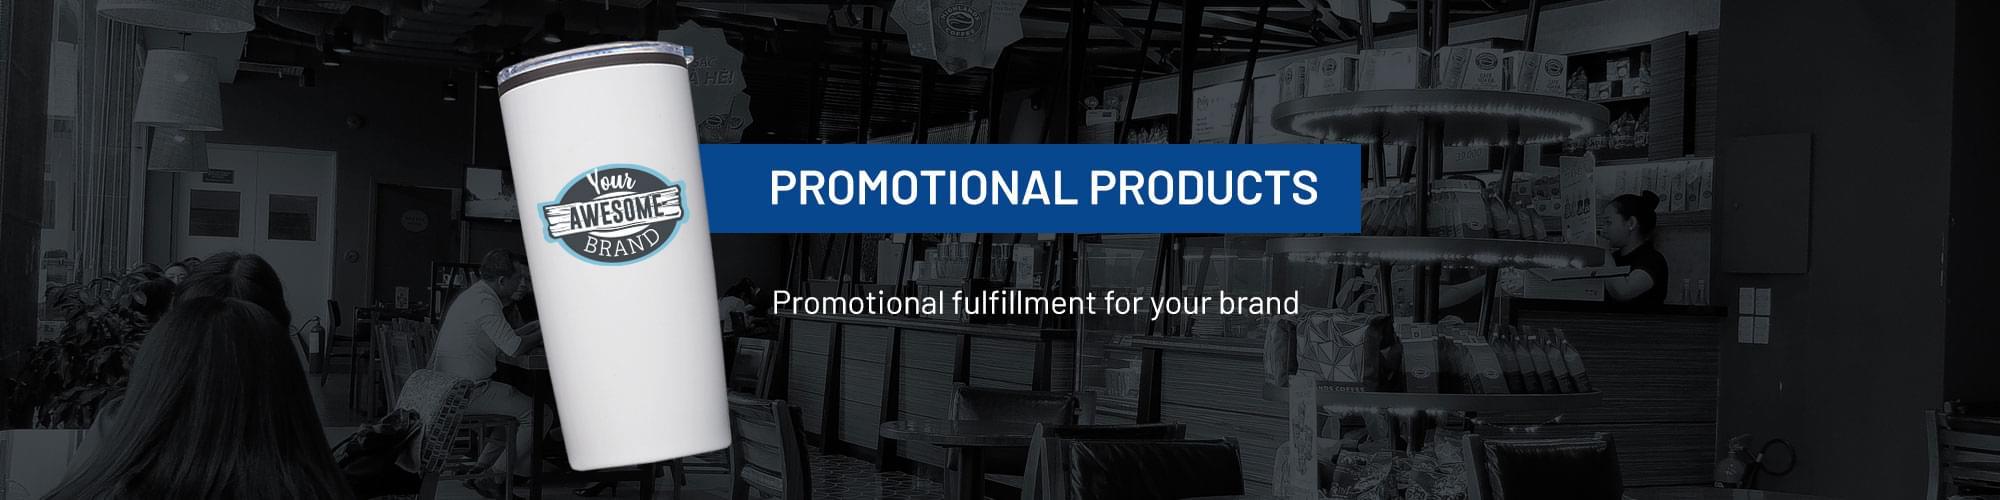 apparel-program-banner